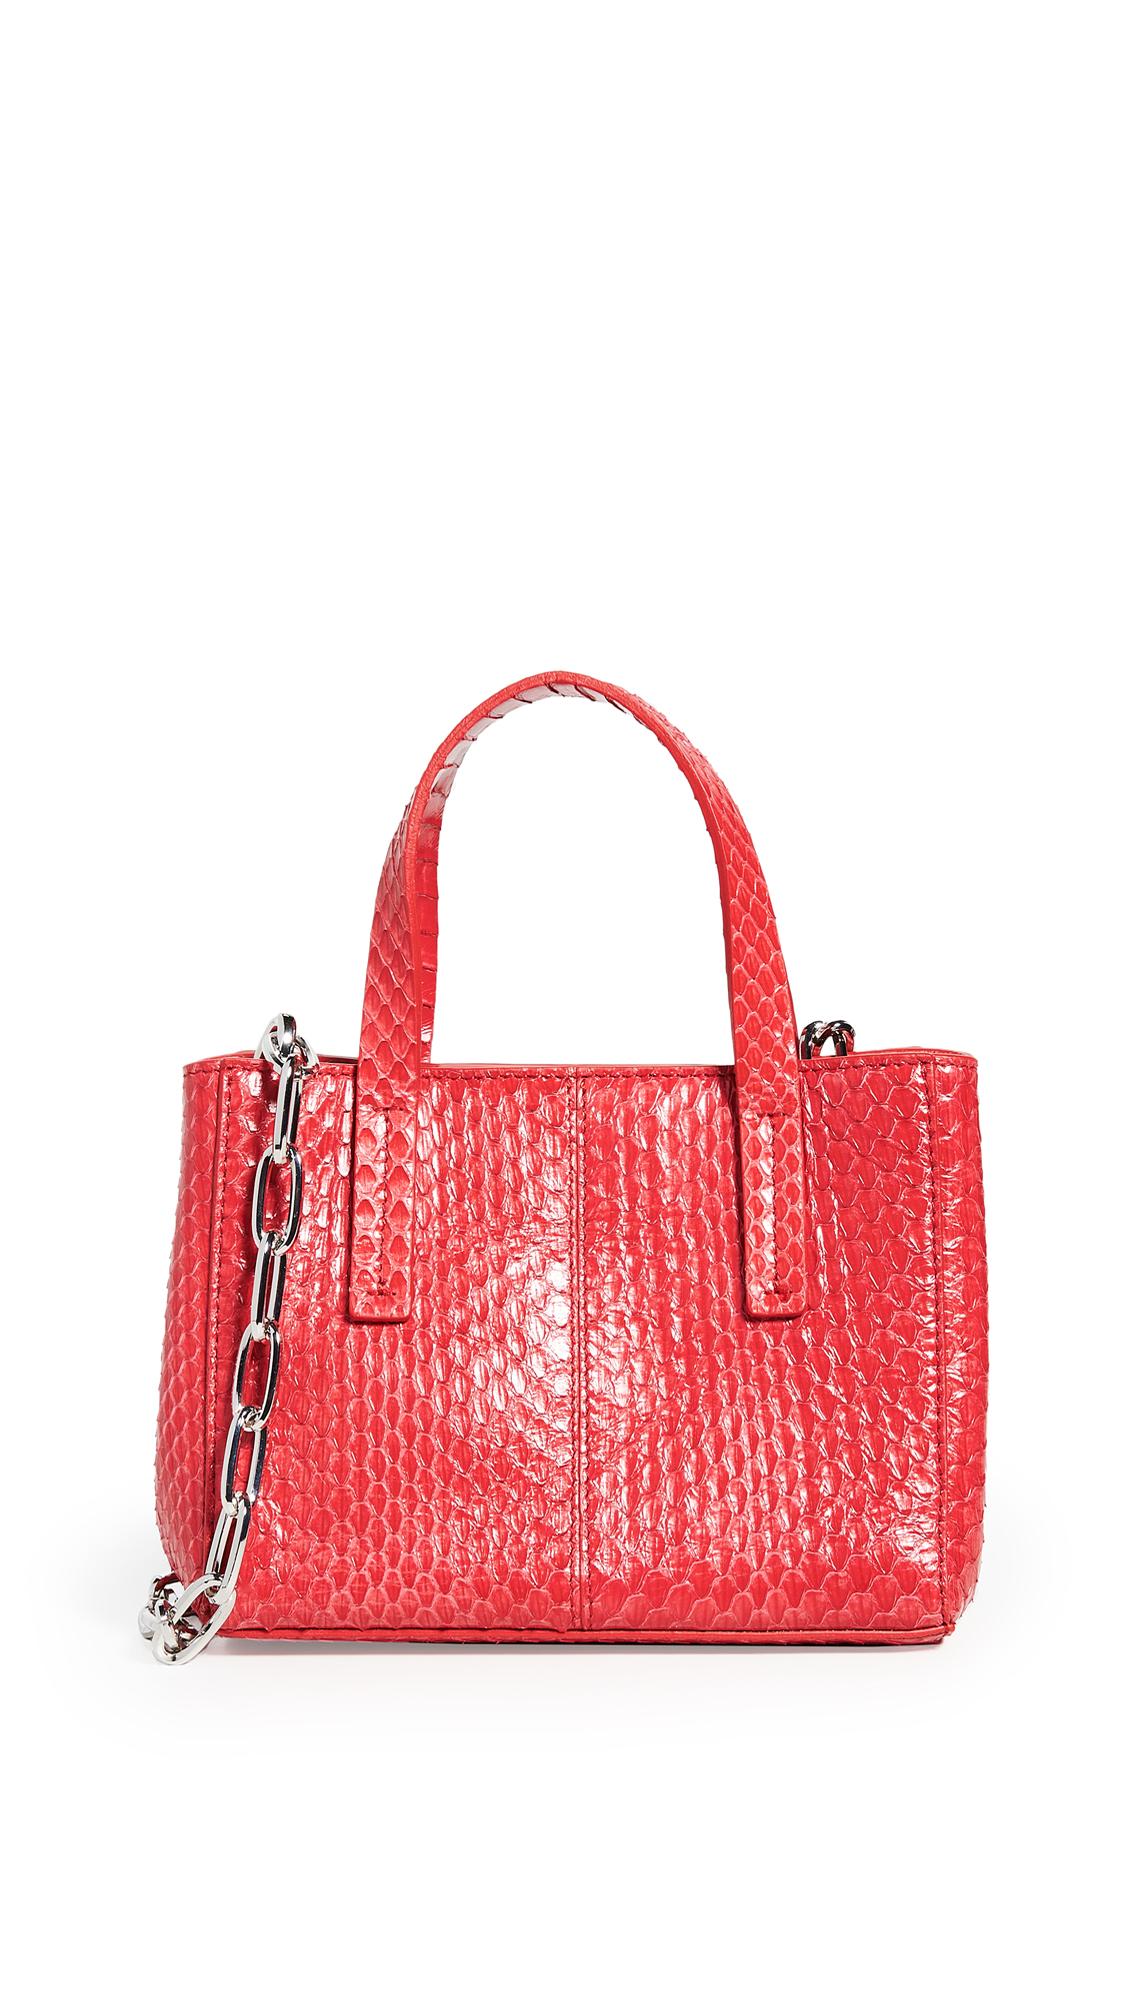 Tibi Le Client Mini Bag - Red